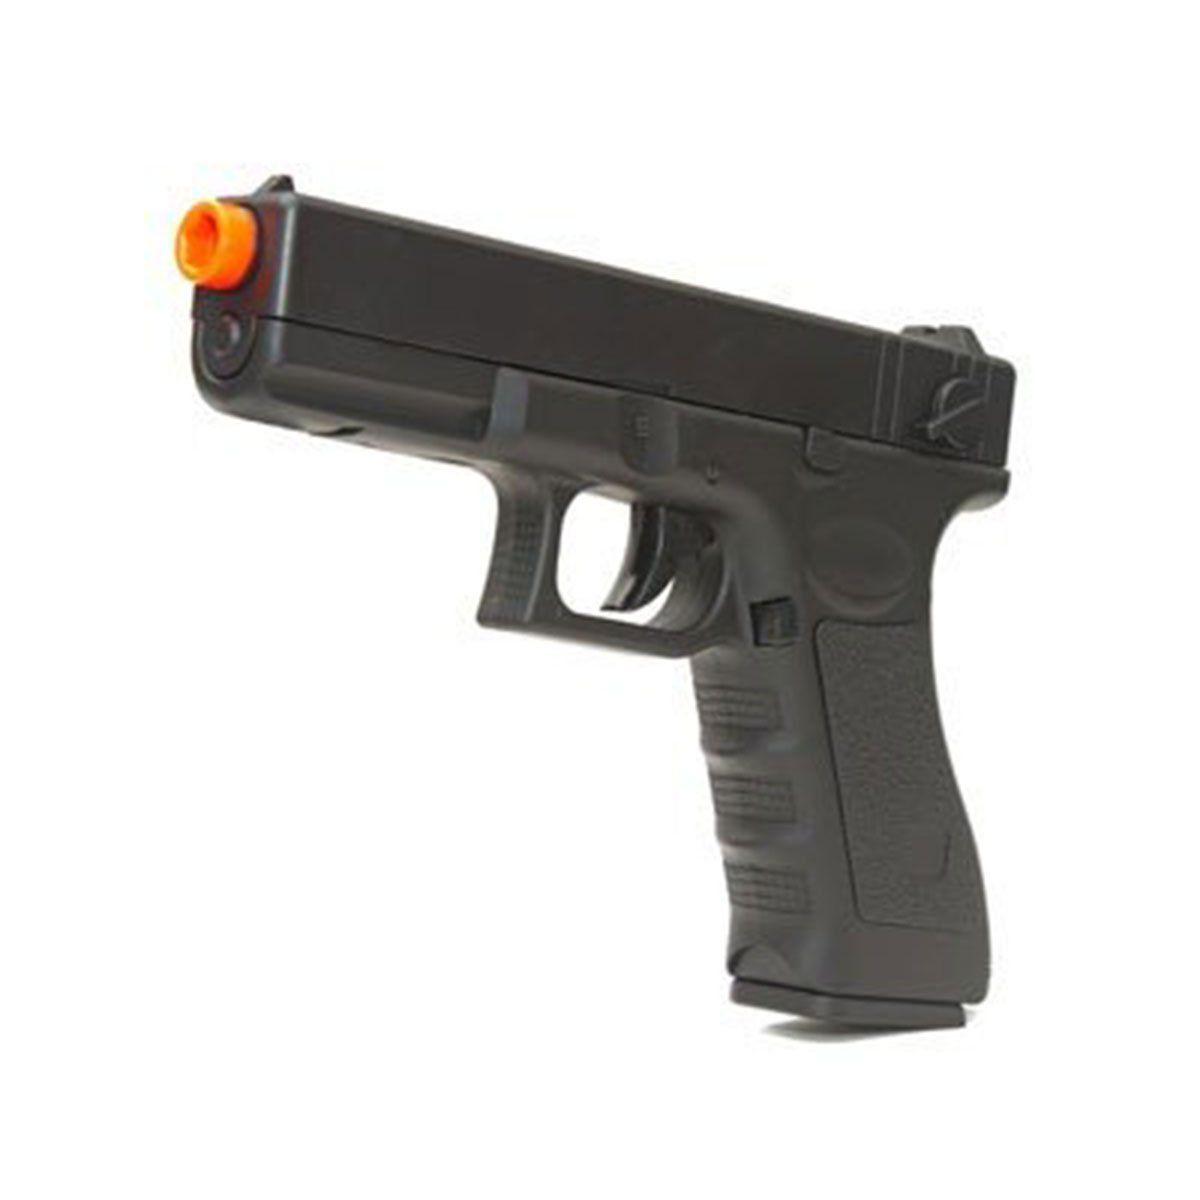 Pistola de Airsoft Cyma CM 030 Glock G18 Elétrica Bivolt 6mm